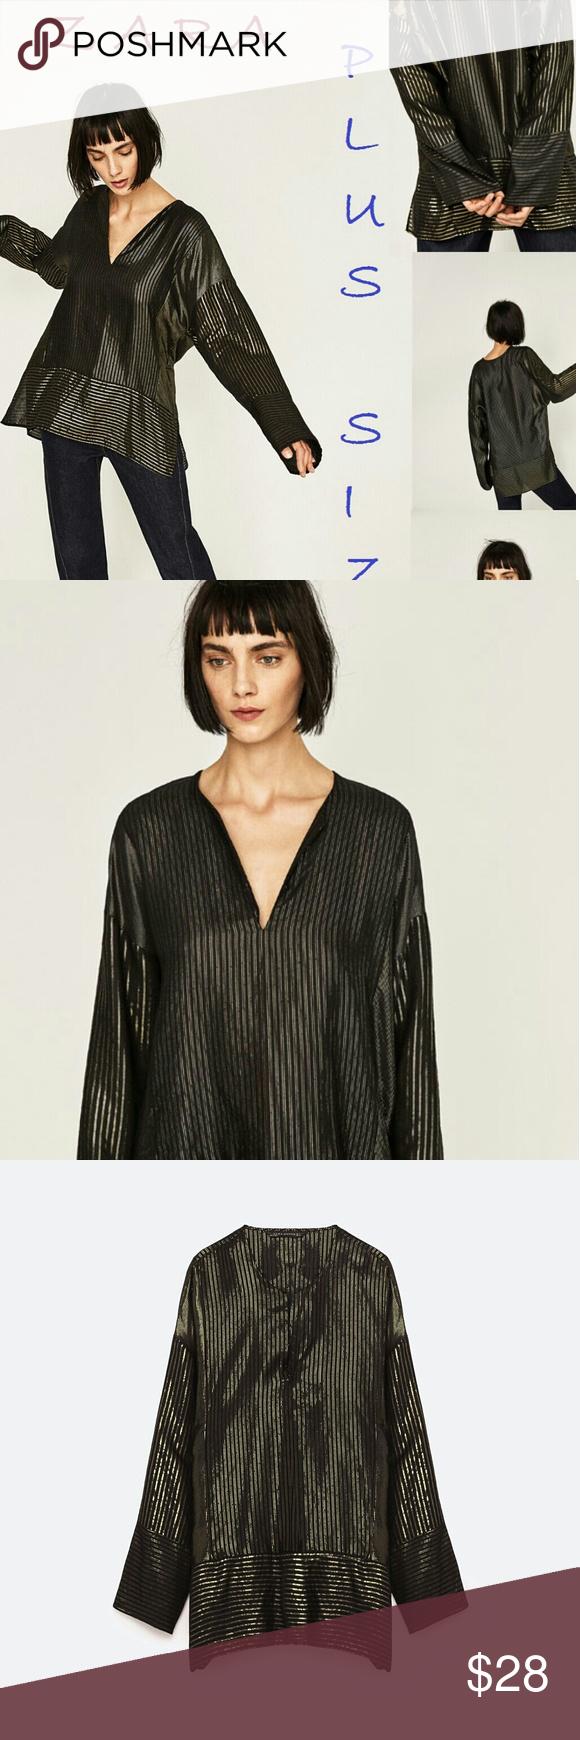 Zara Plus Size Striped Shiny Patchwork Tunic Boutique Patchwork